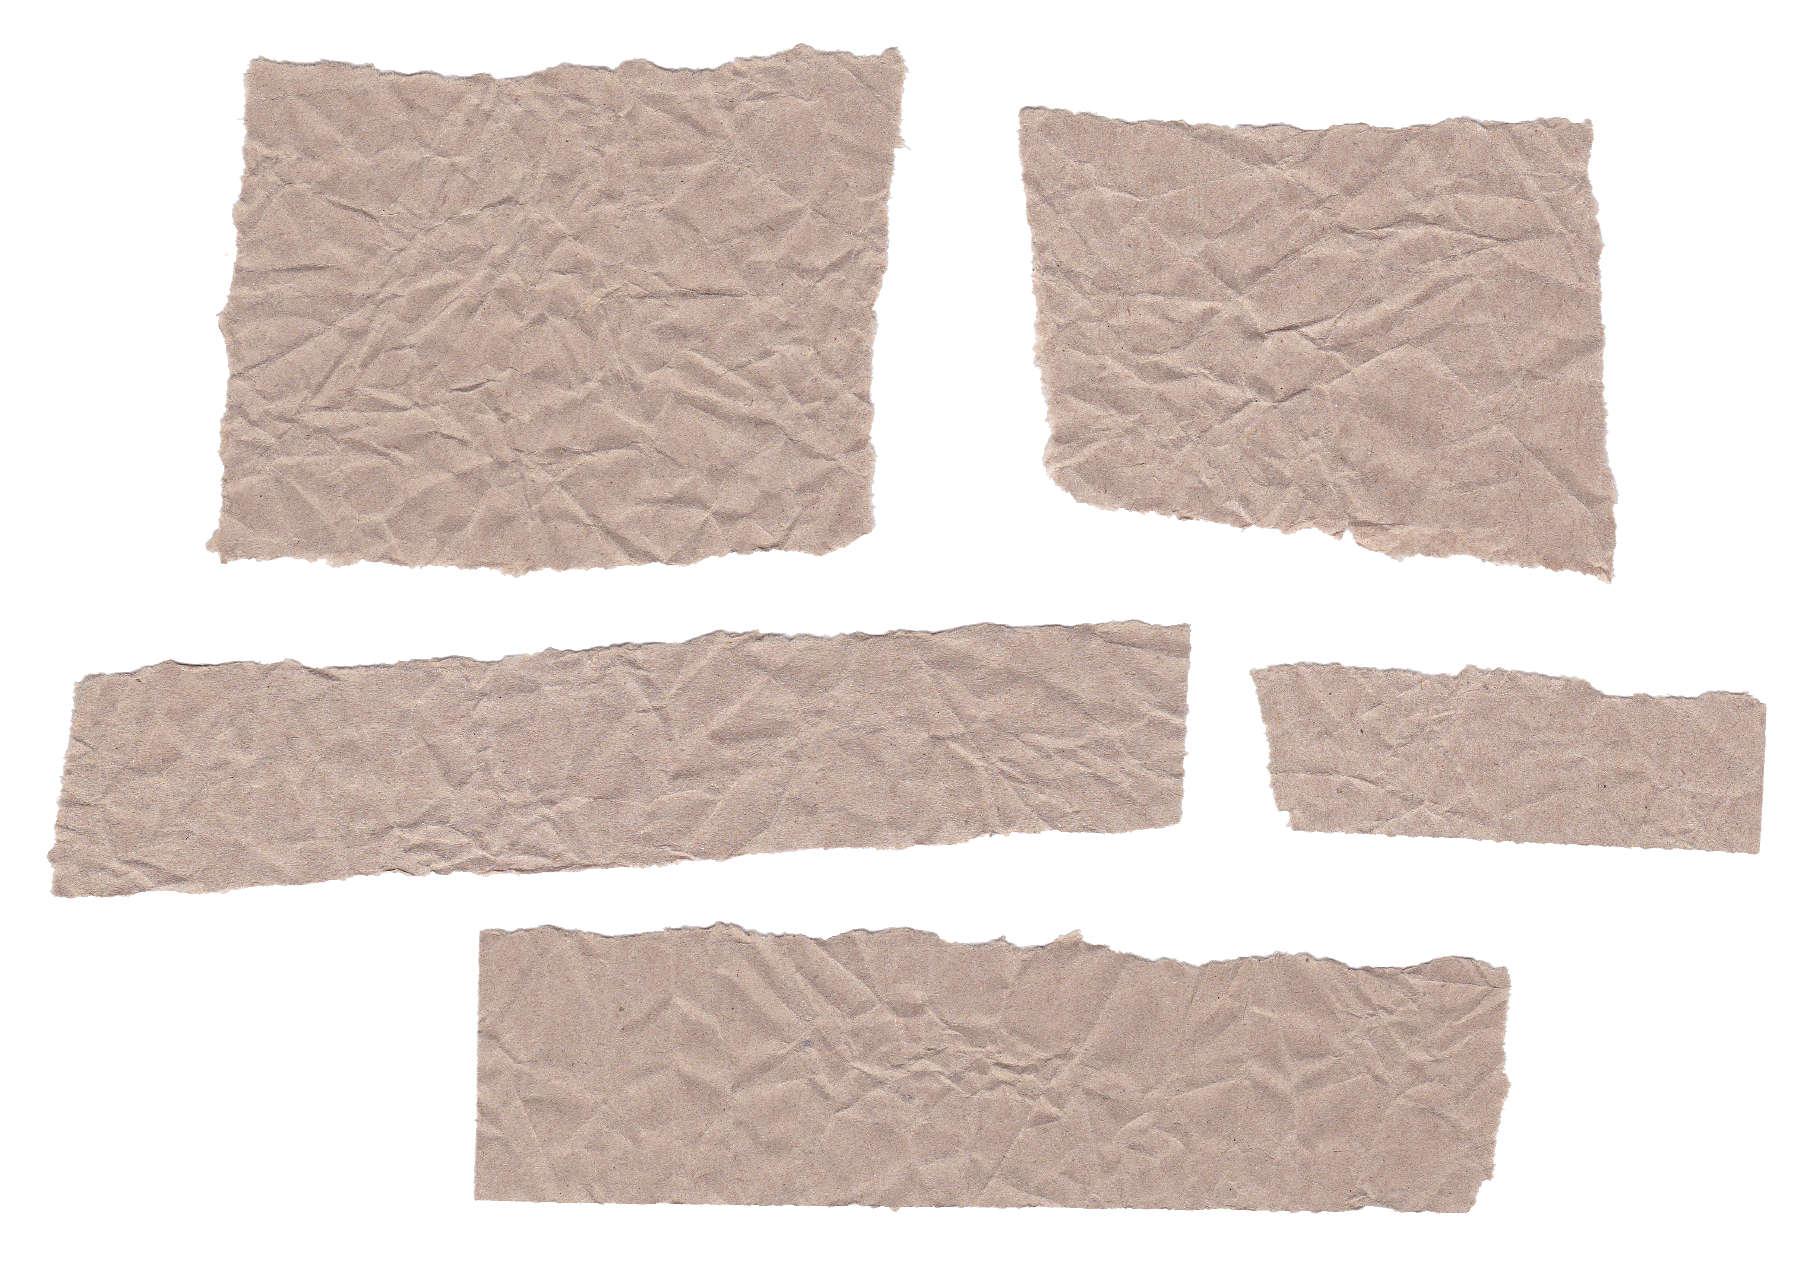 5-wrinkled-paper-banner-label-cover.jpg